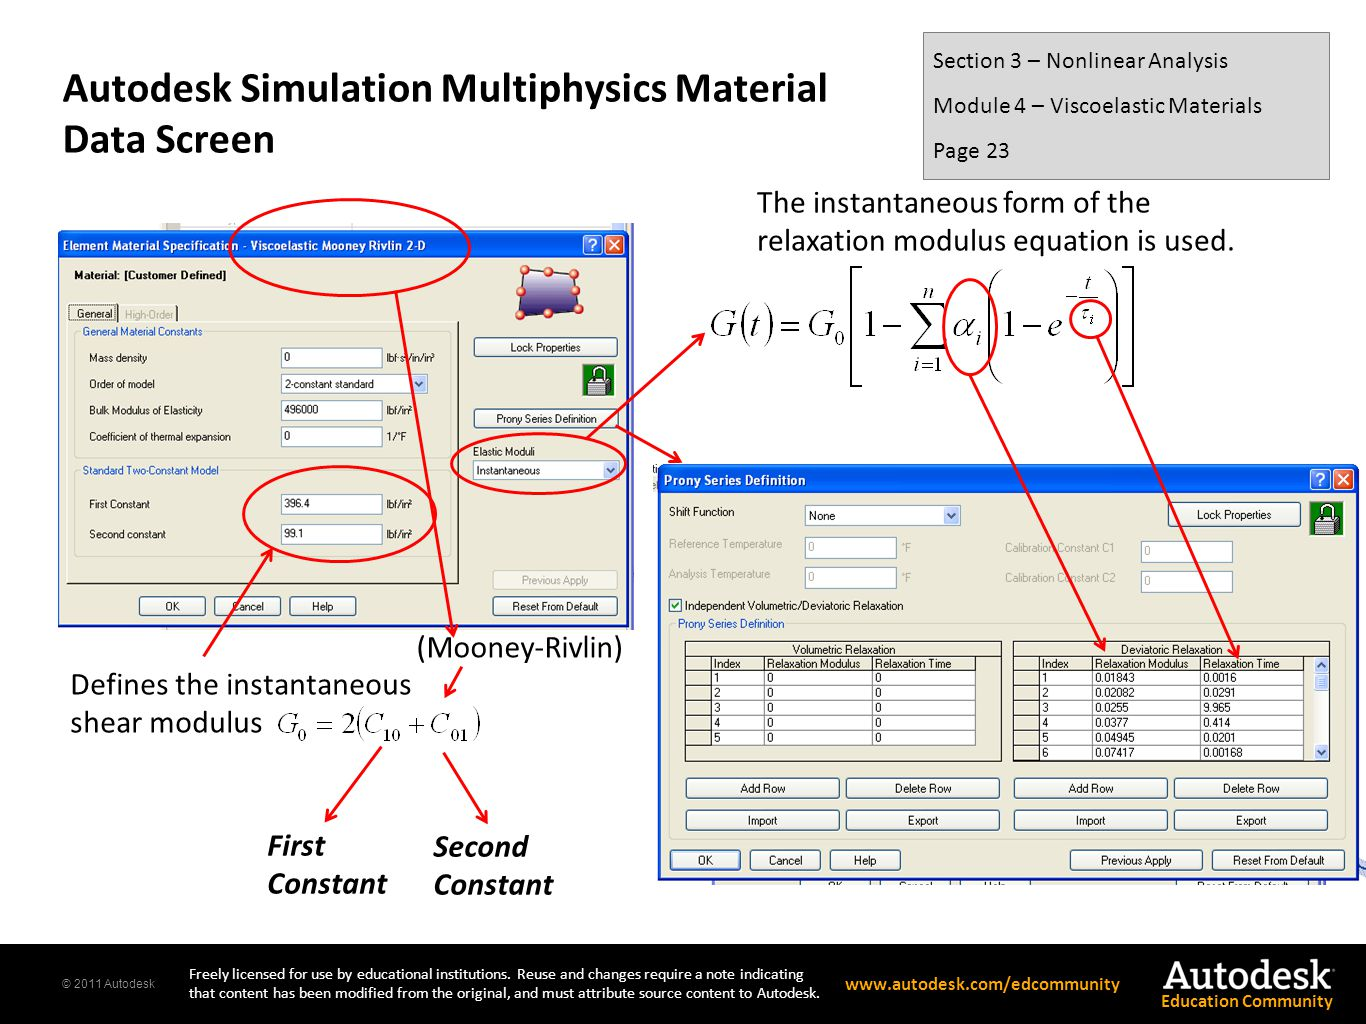 Autodesk Simulation Multiphysics Material Data Screen